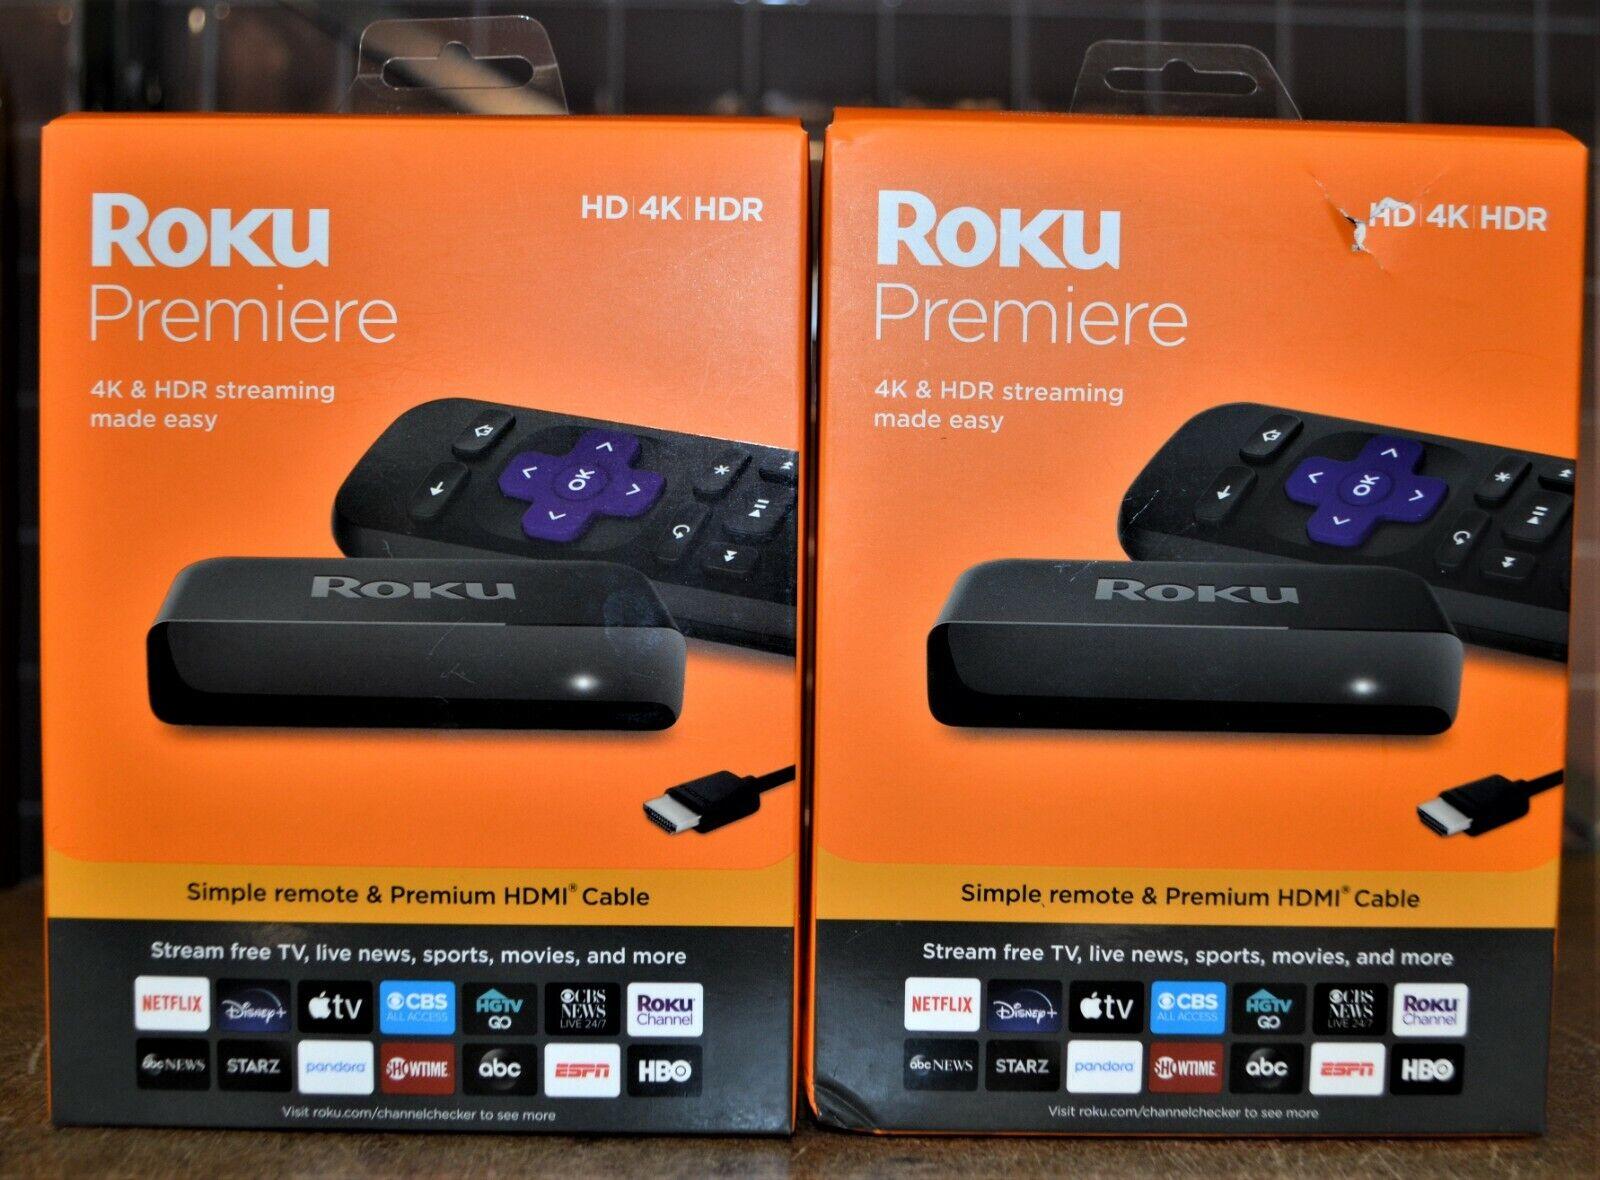 SET of 2 - Roku Premiere HD/4K/HDR Streaming Media Player #3920R - NEW media new player premiere roku set streaming